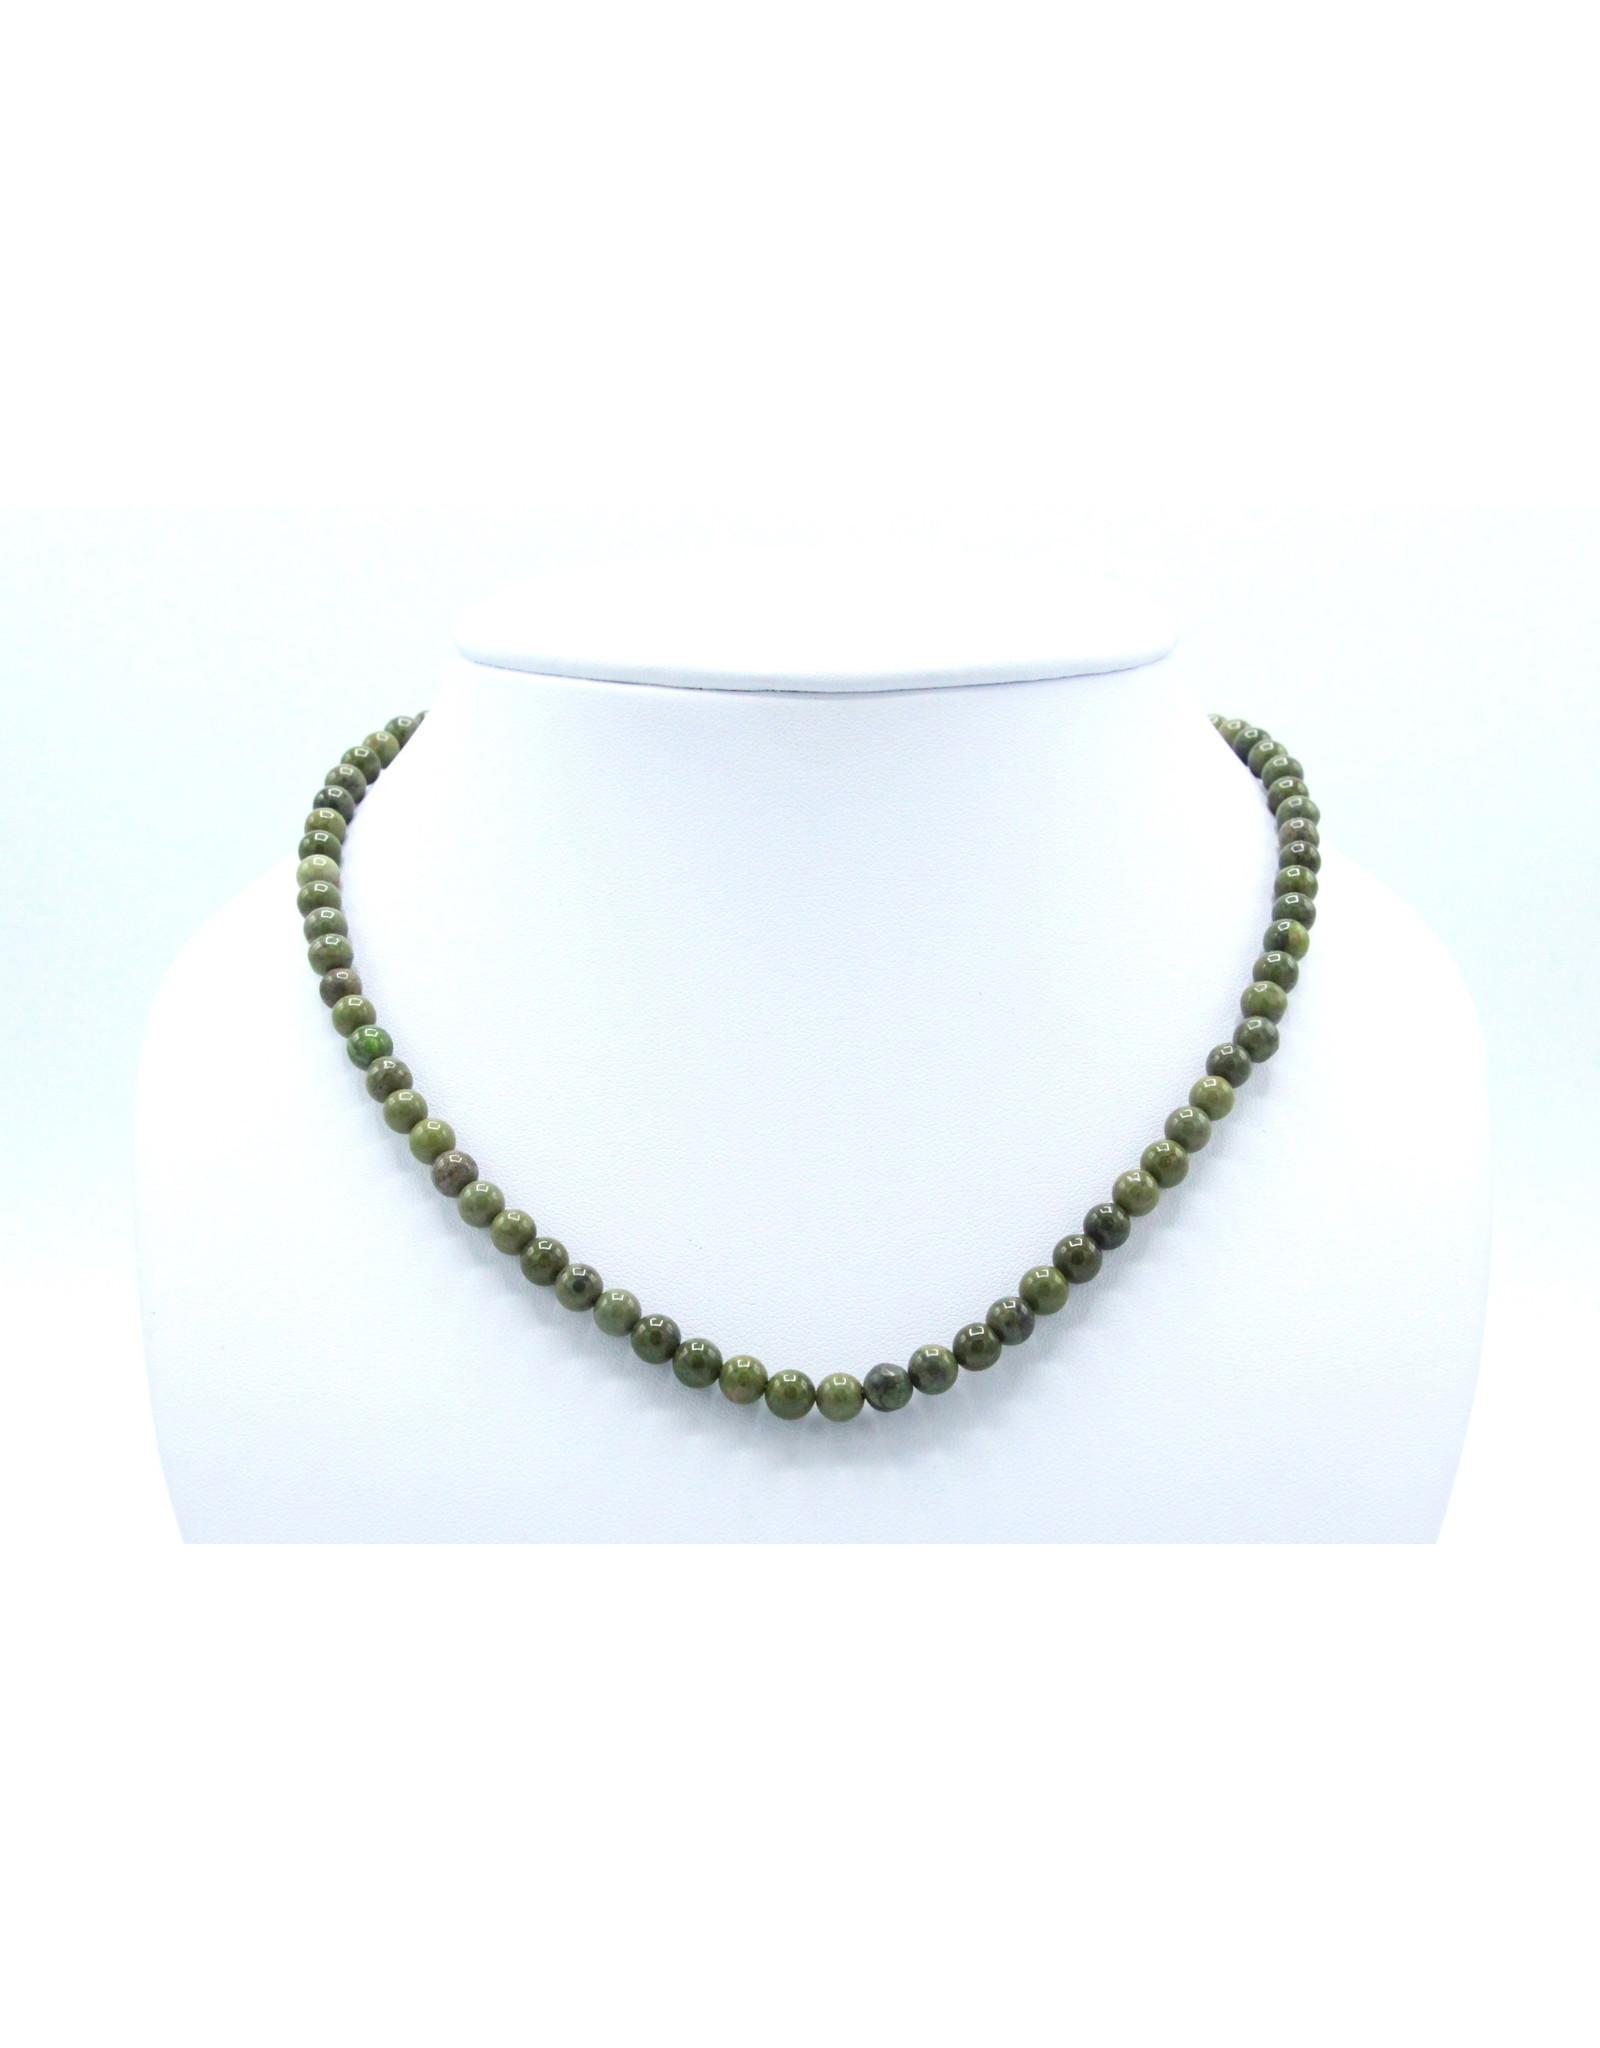 Epidote Necklace - NEPI03